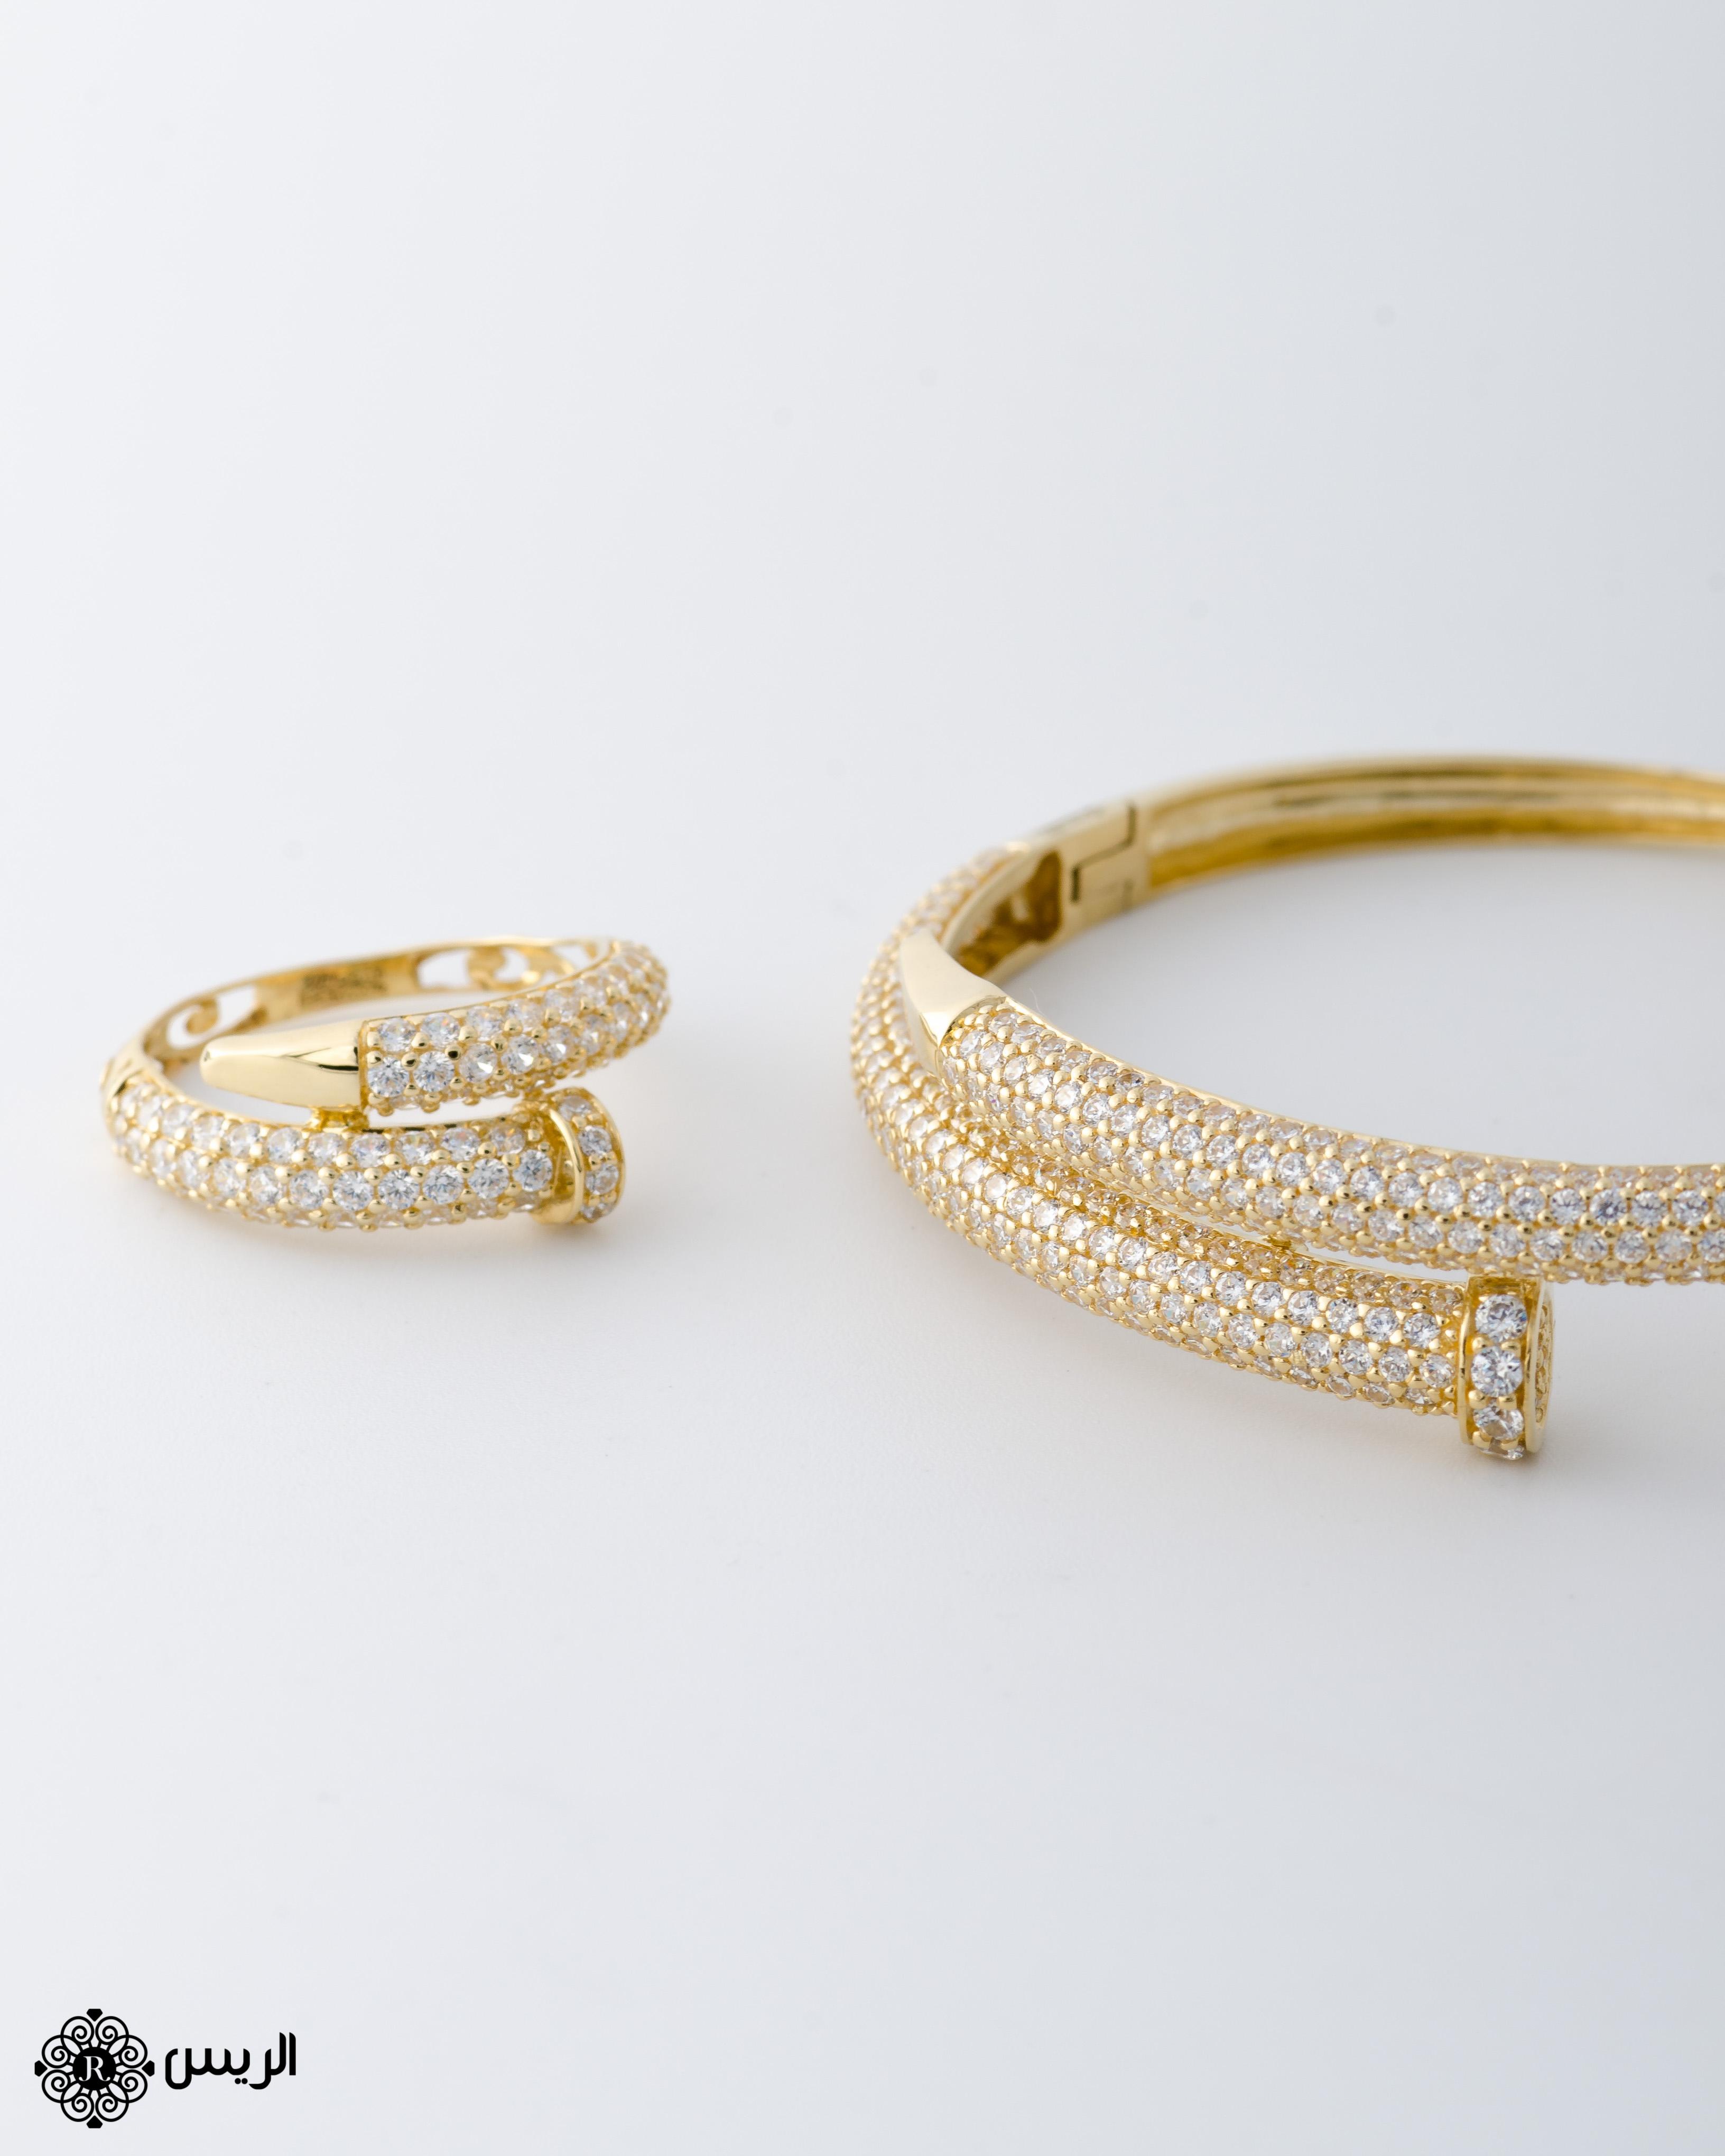 Raies jewelry Bangle Nail with Ring إسورة مسمار مع خاتم الريس للمجوهرات